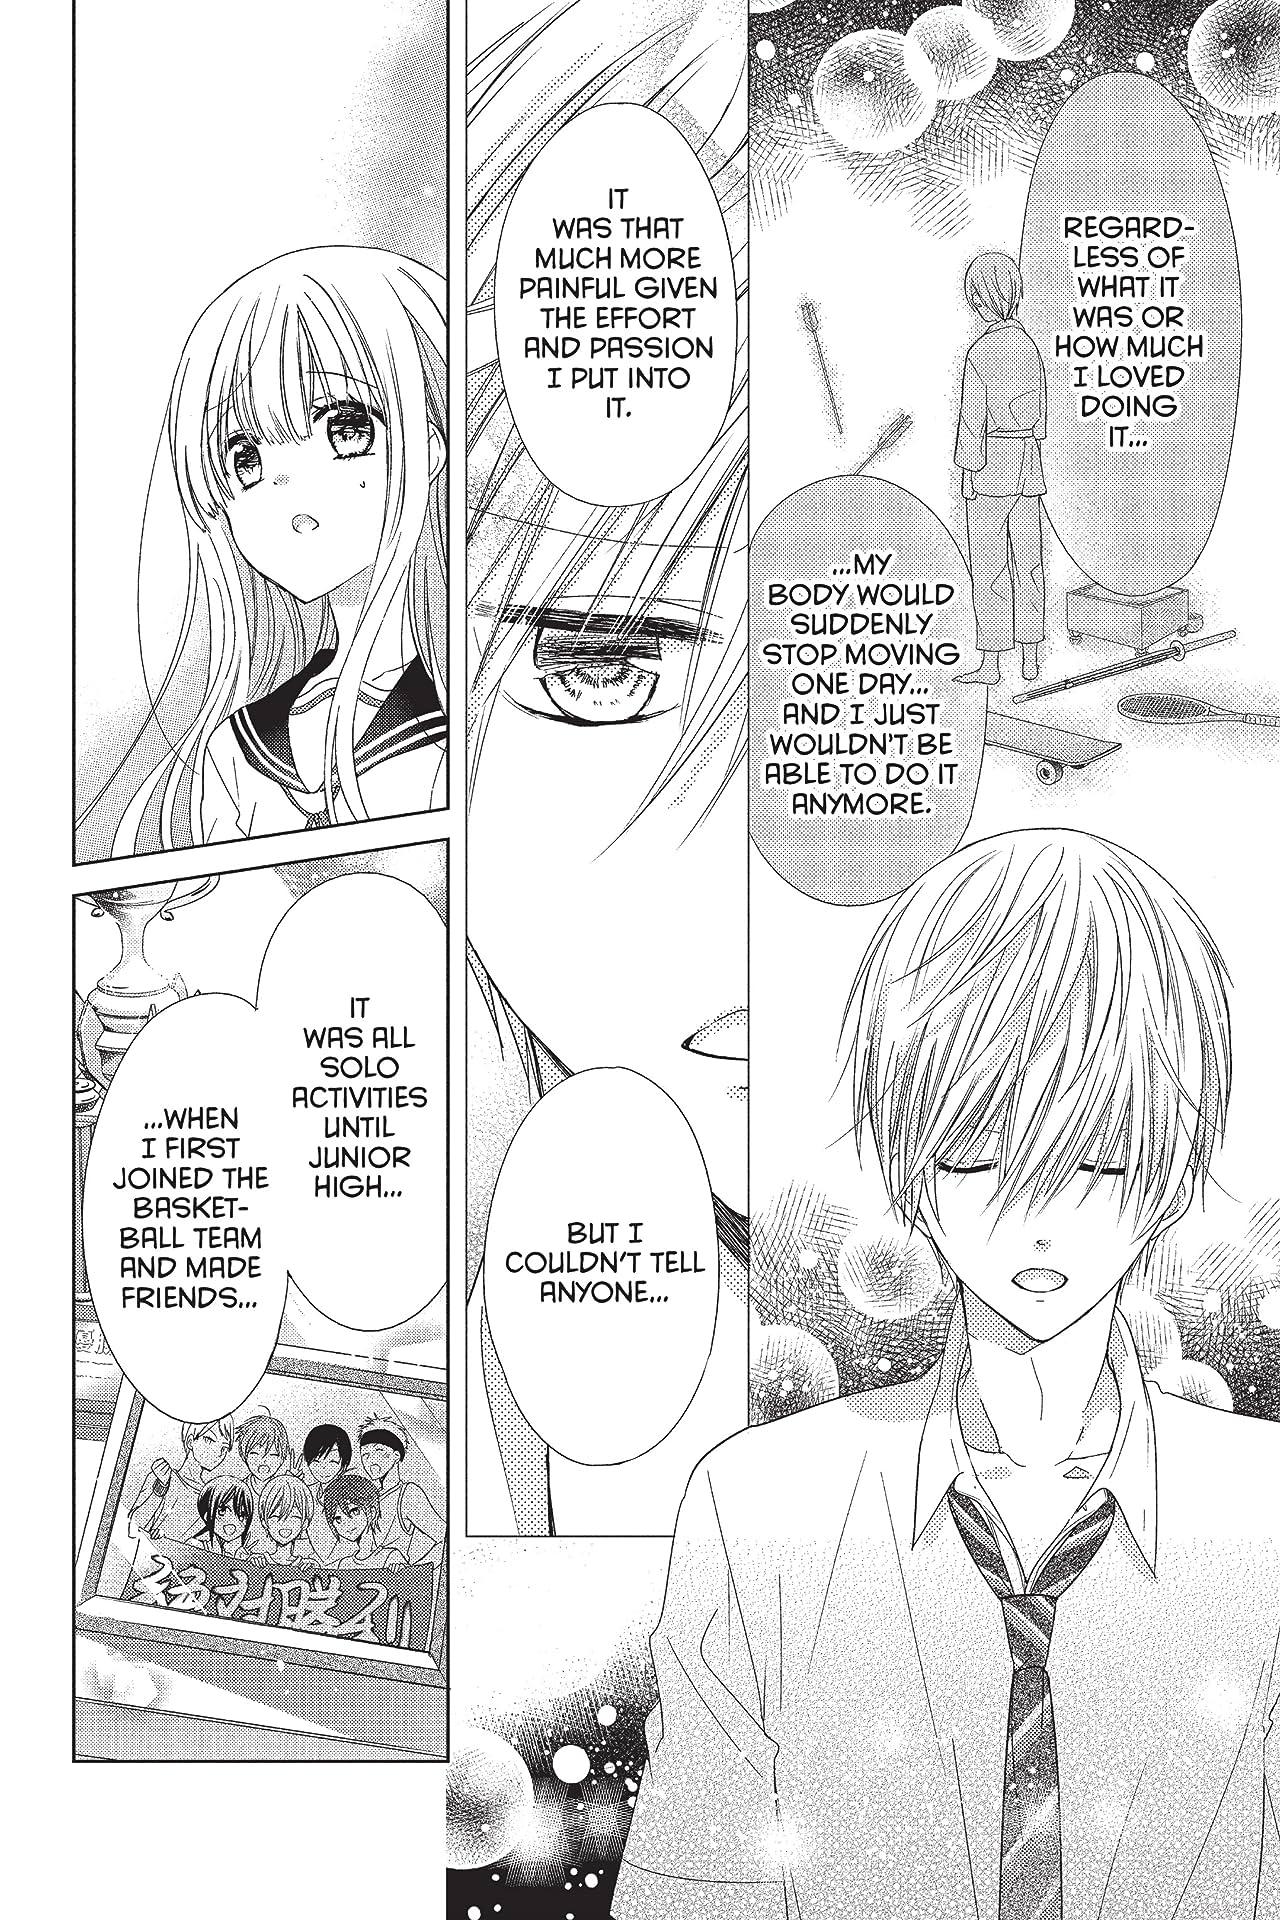 Aoba-kun's Confessions Vol. 4